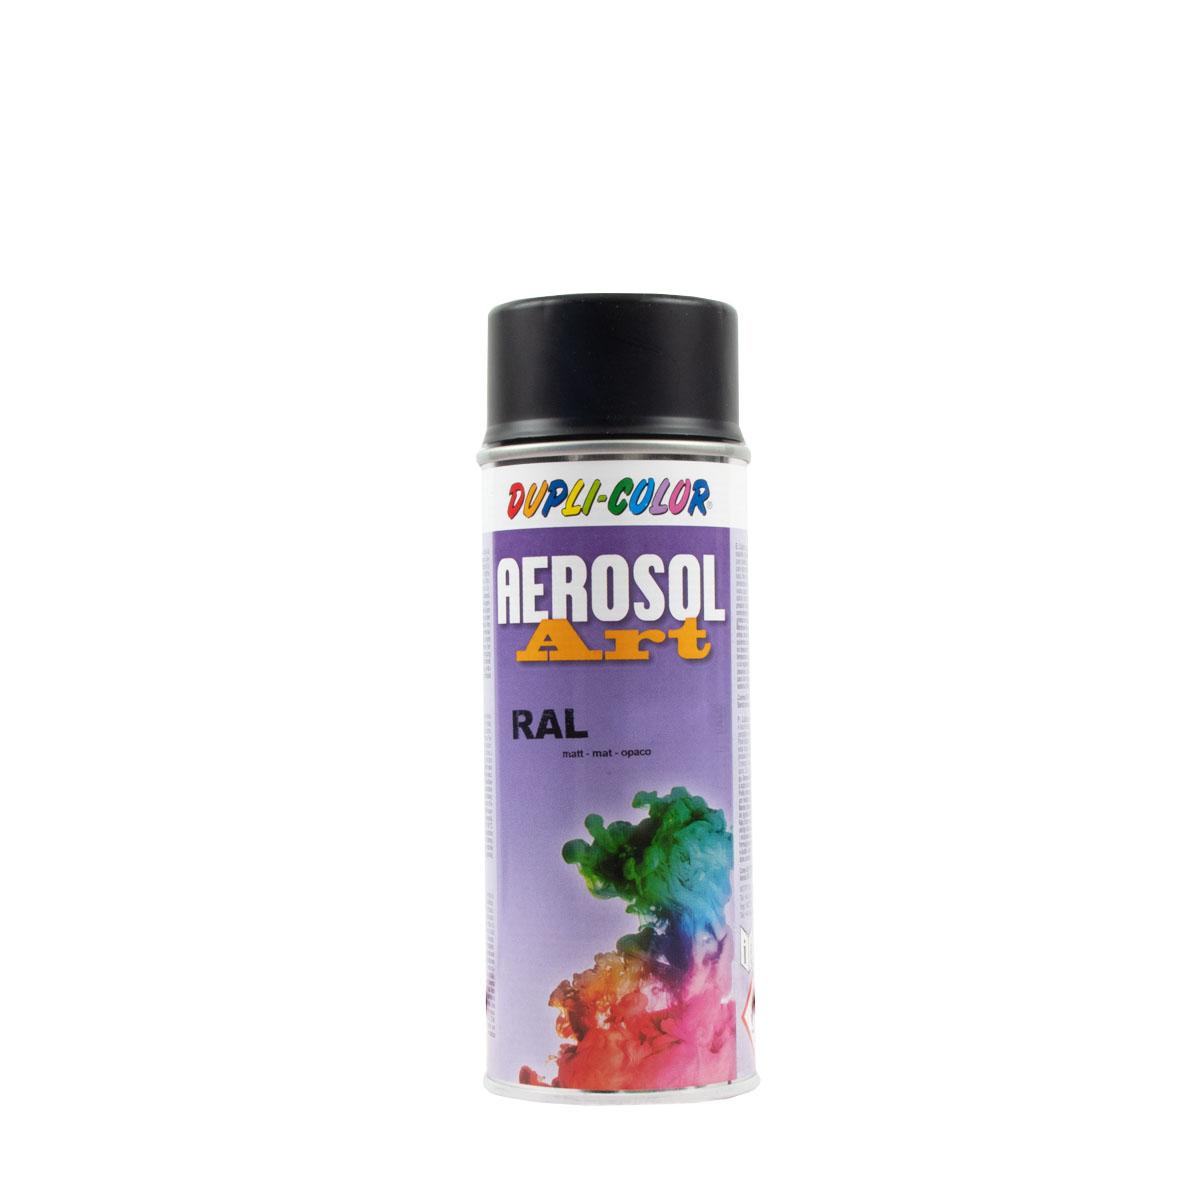 Dupli-Color Aerosol-Art matt 400ml versch. Farbtöne, Sprühlack